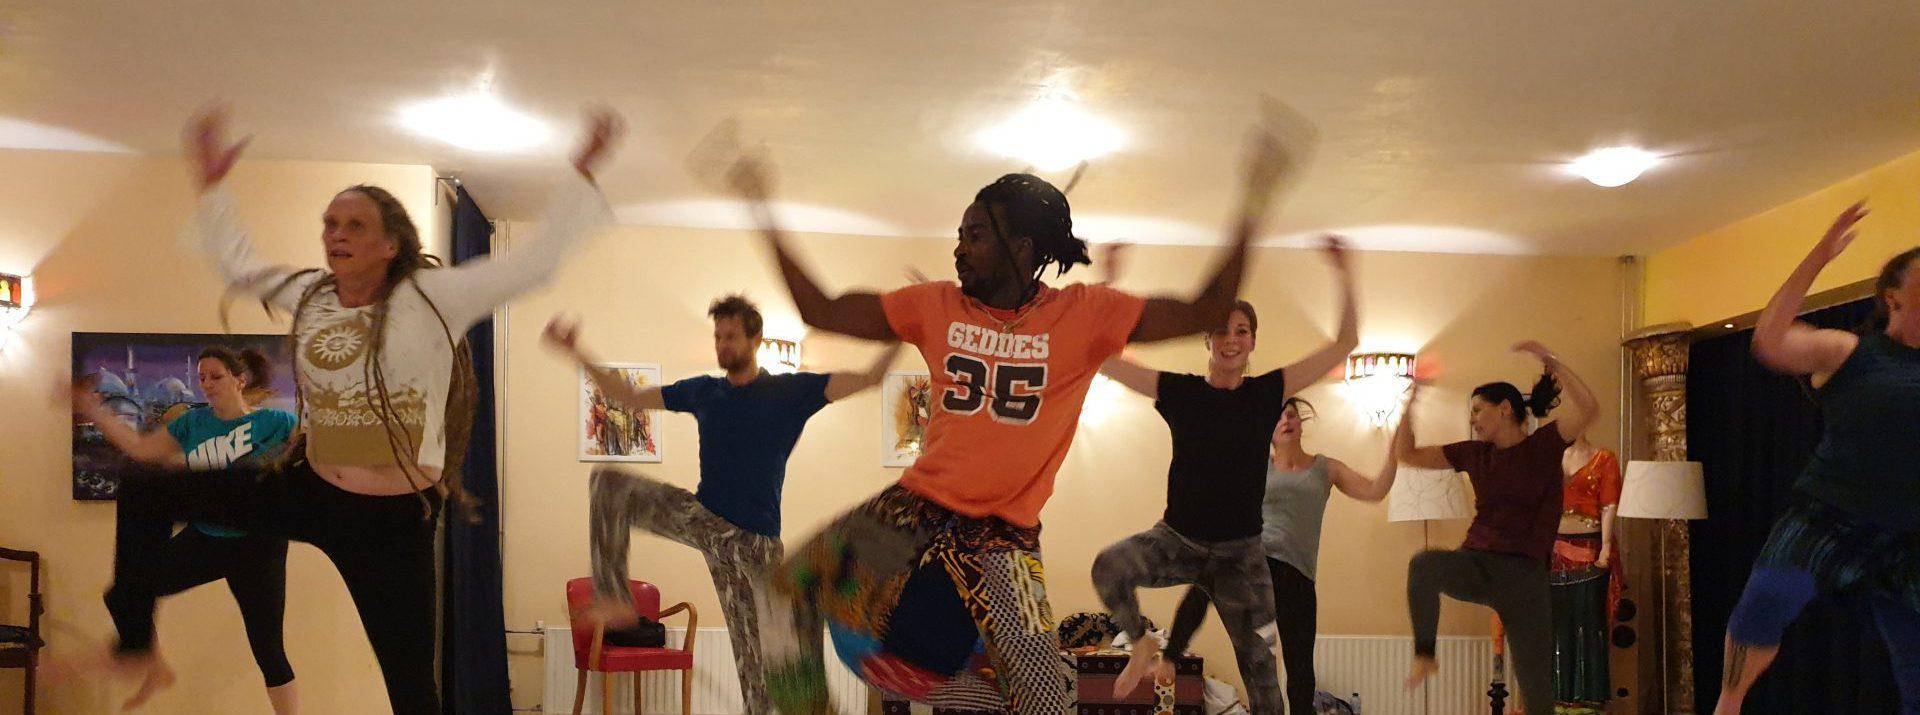 Afrikaanse dansles groningen Issiaga Soumah live percussie